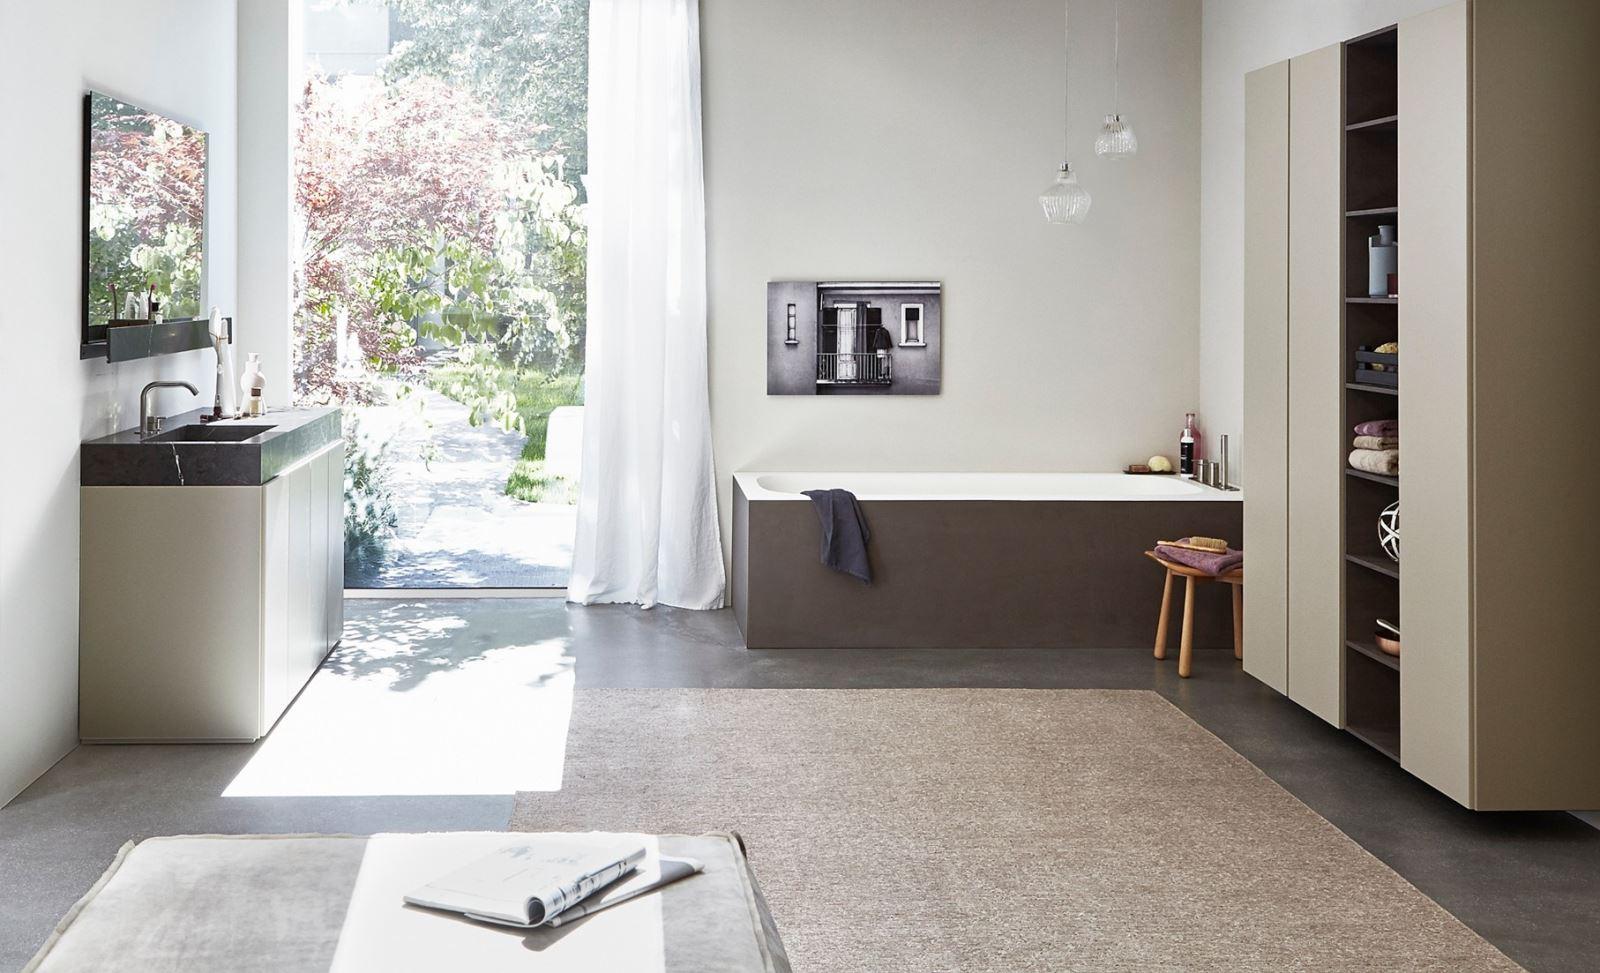 arredo bagno r1, semplice, lineare, architettonica - Arredo Bagno Semplice